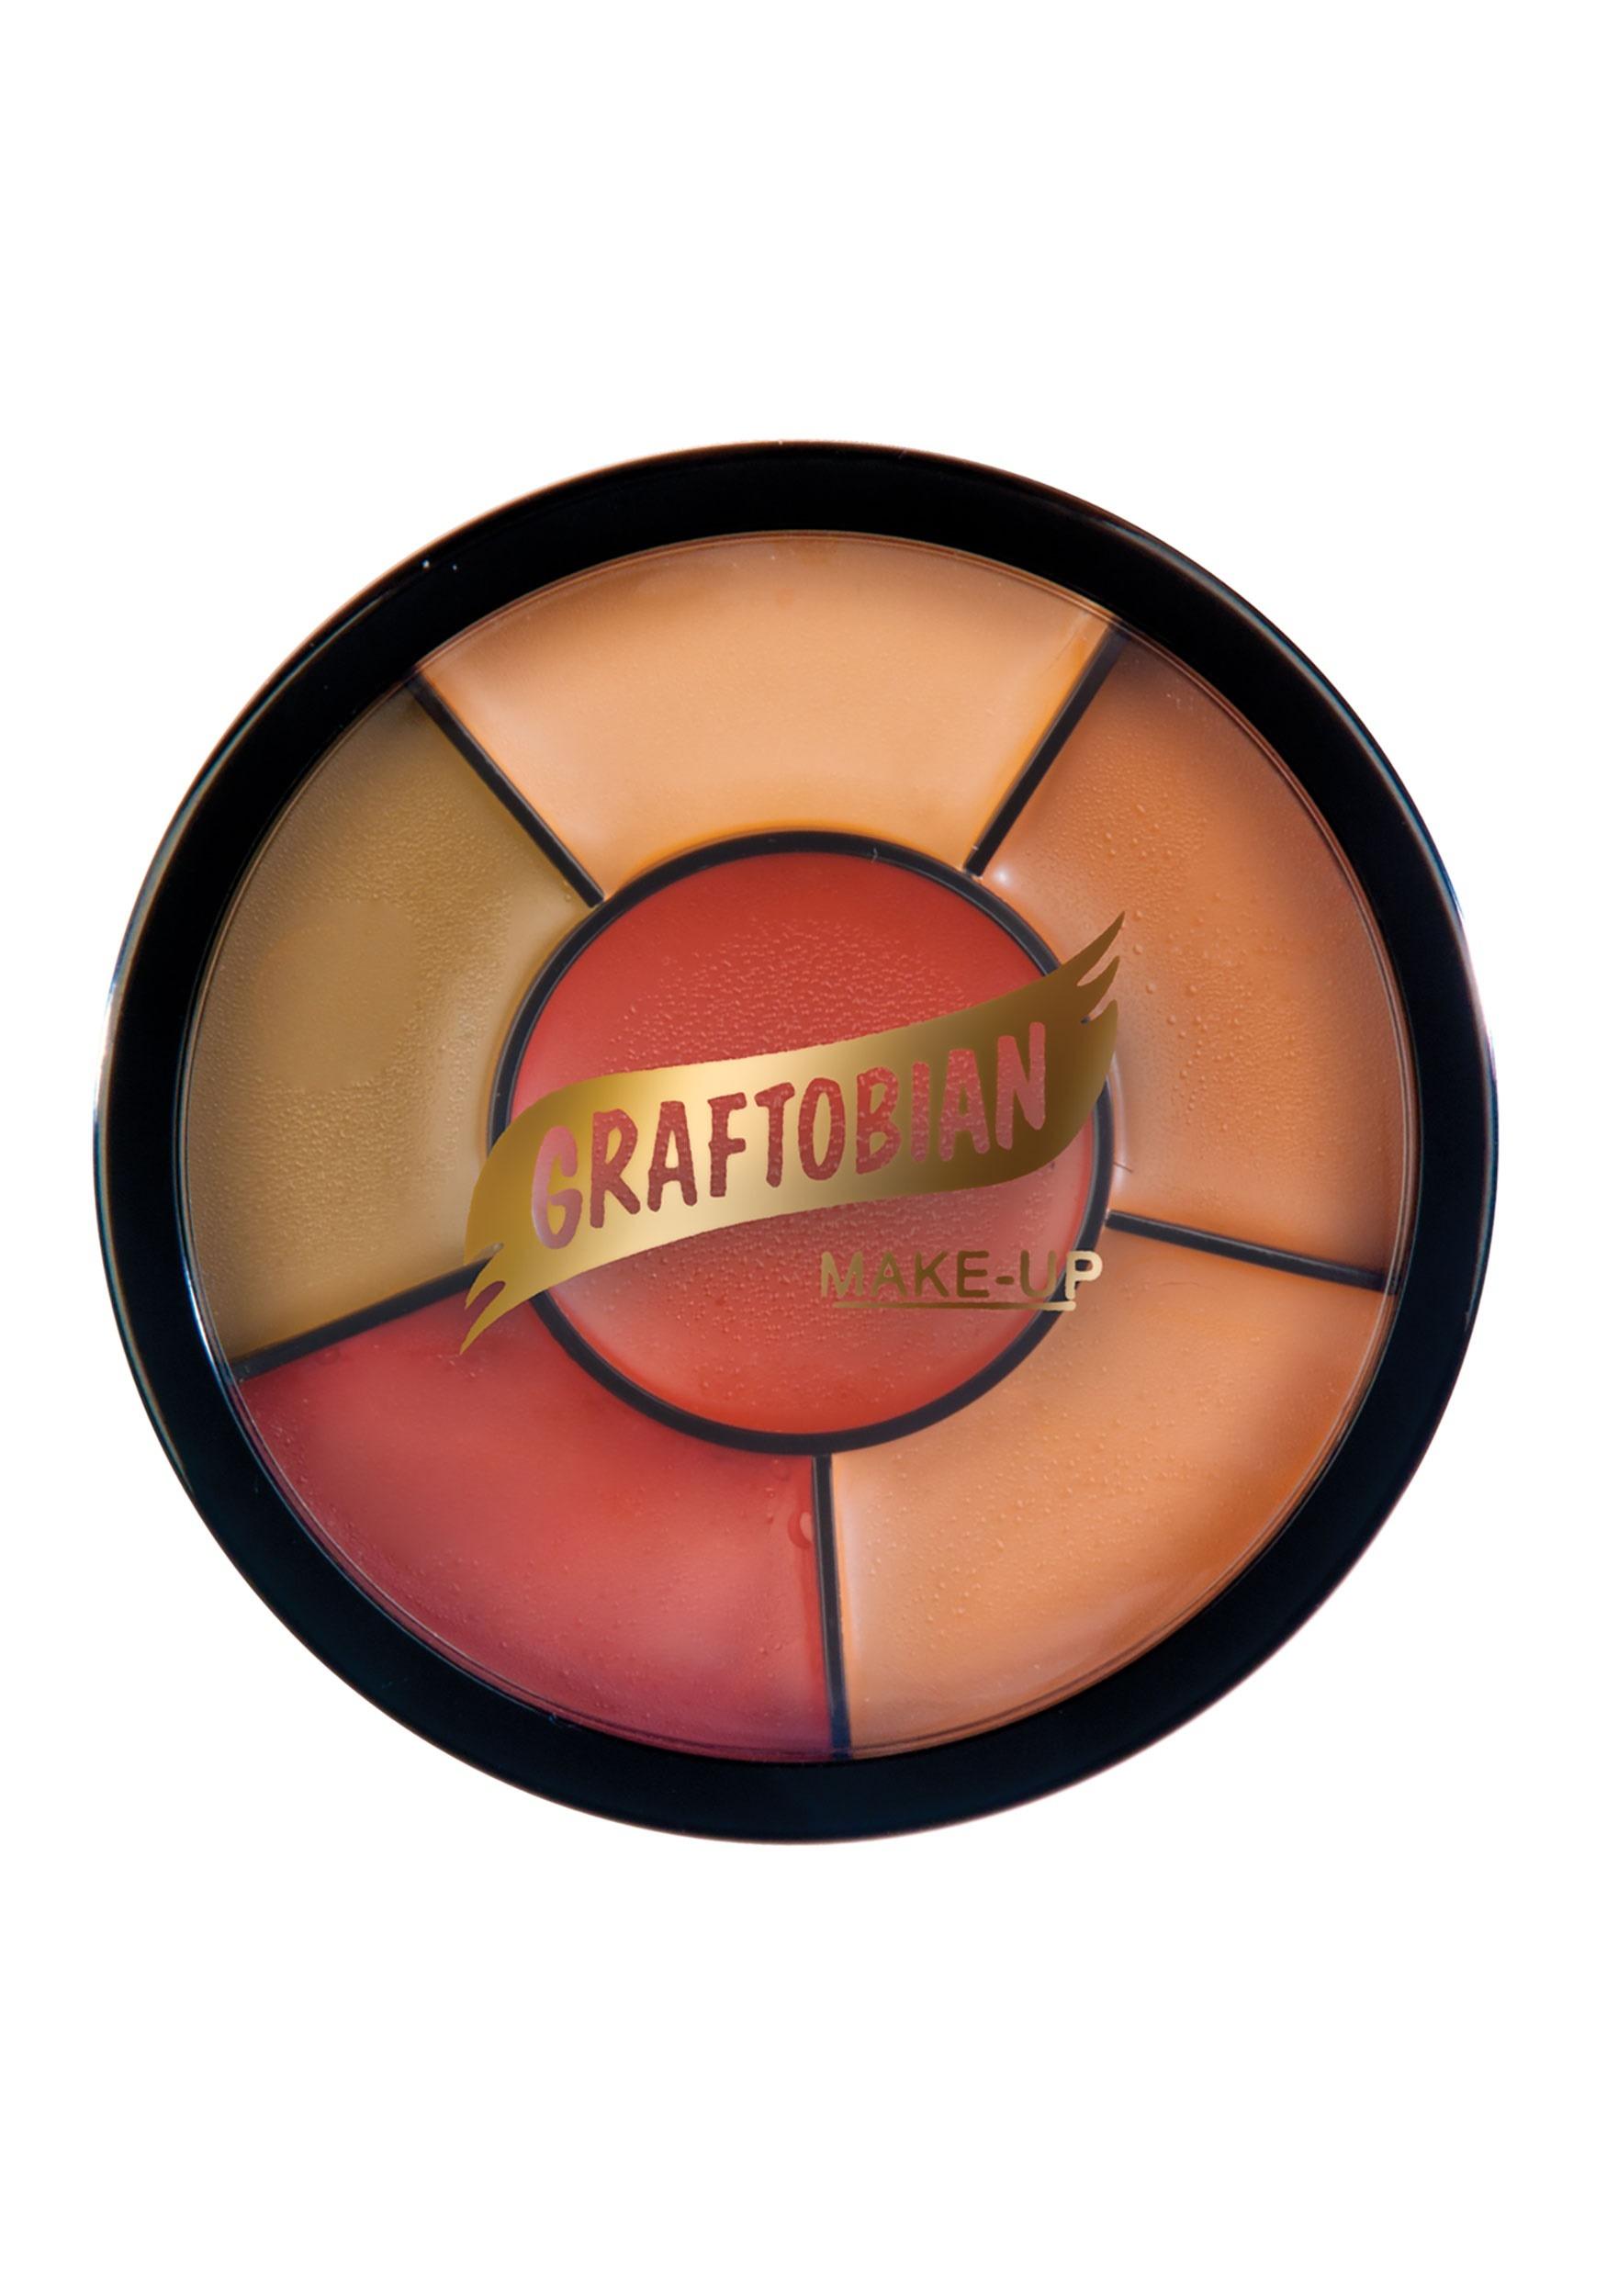 Graftobian dark tattoo cover up makeup wheel for Best tattoo cover up makeup